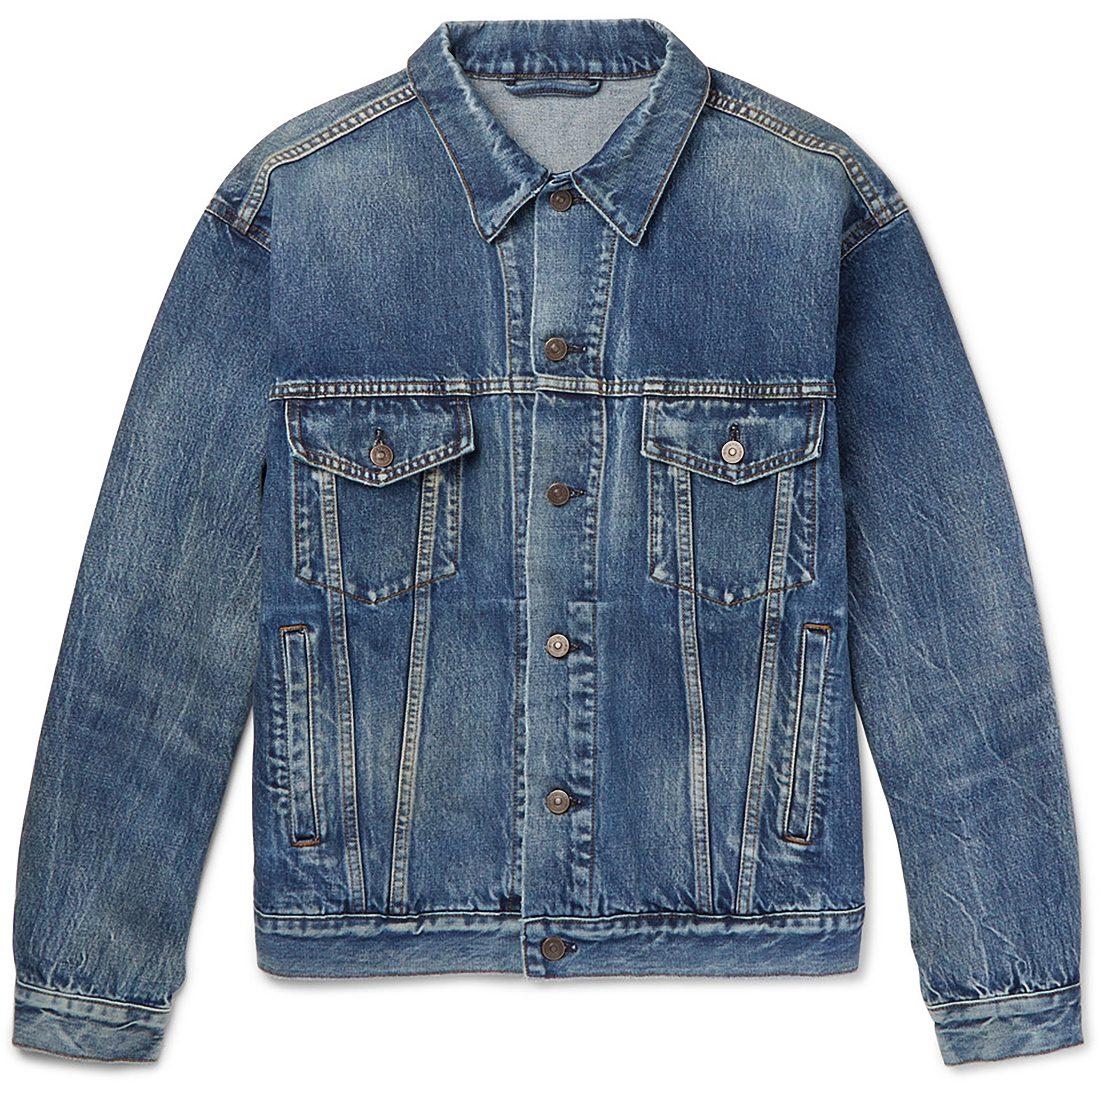 mr-porter-x-balenciaga-like-a-man-oversized-printed-denim-jacket-1018713_mrp_in_xl